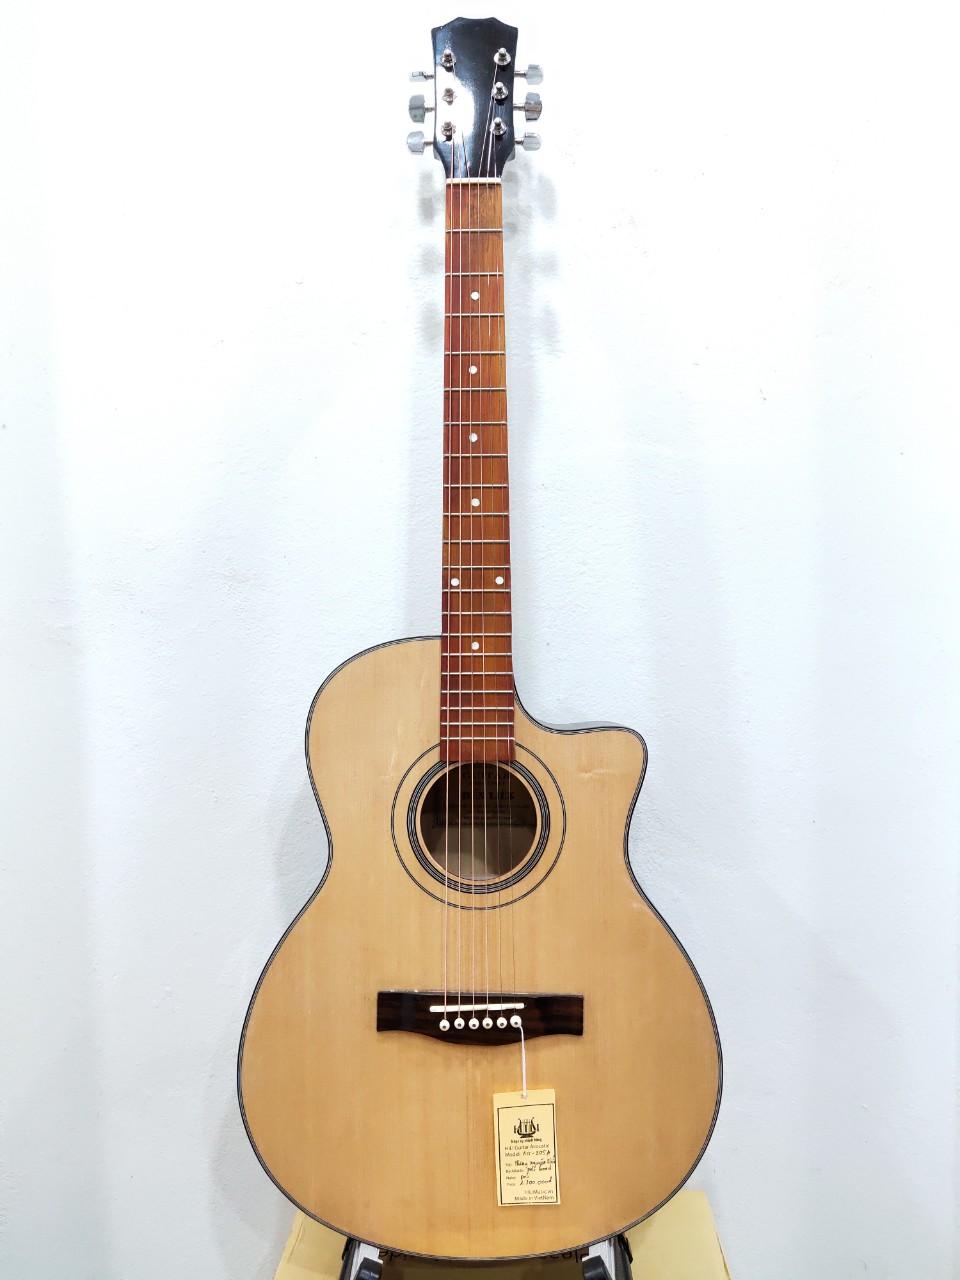 Đàn Guitar Acoustic AG-205A - made in VietNam